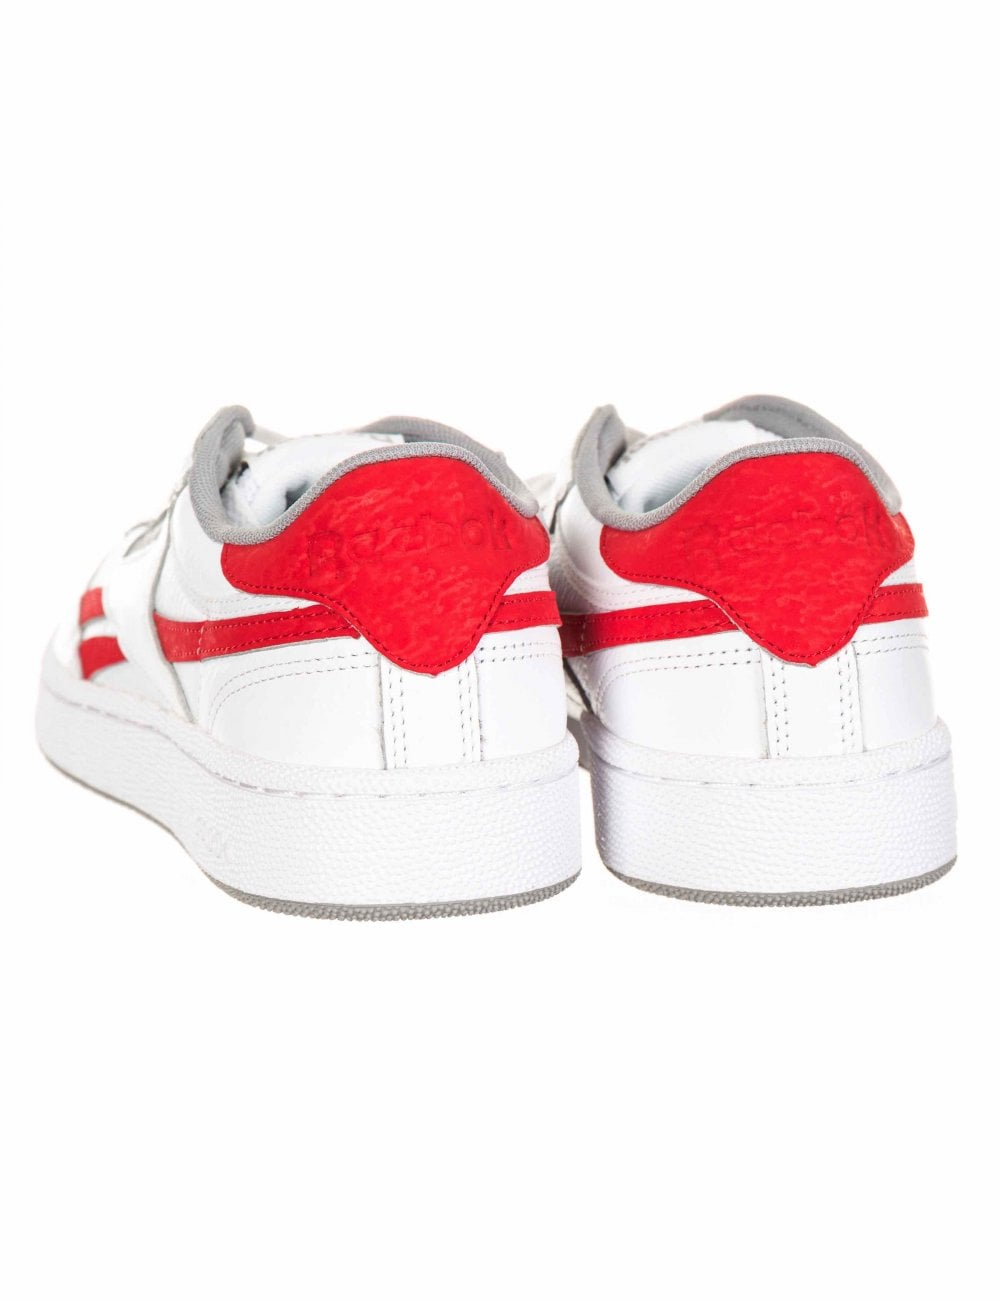 5aae3ffea5a83 Reebok Revenge Plus Trainers - White Primal Red - Footwear from Fat ...